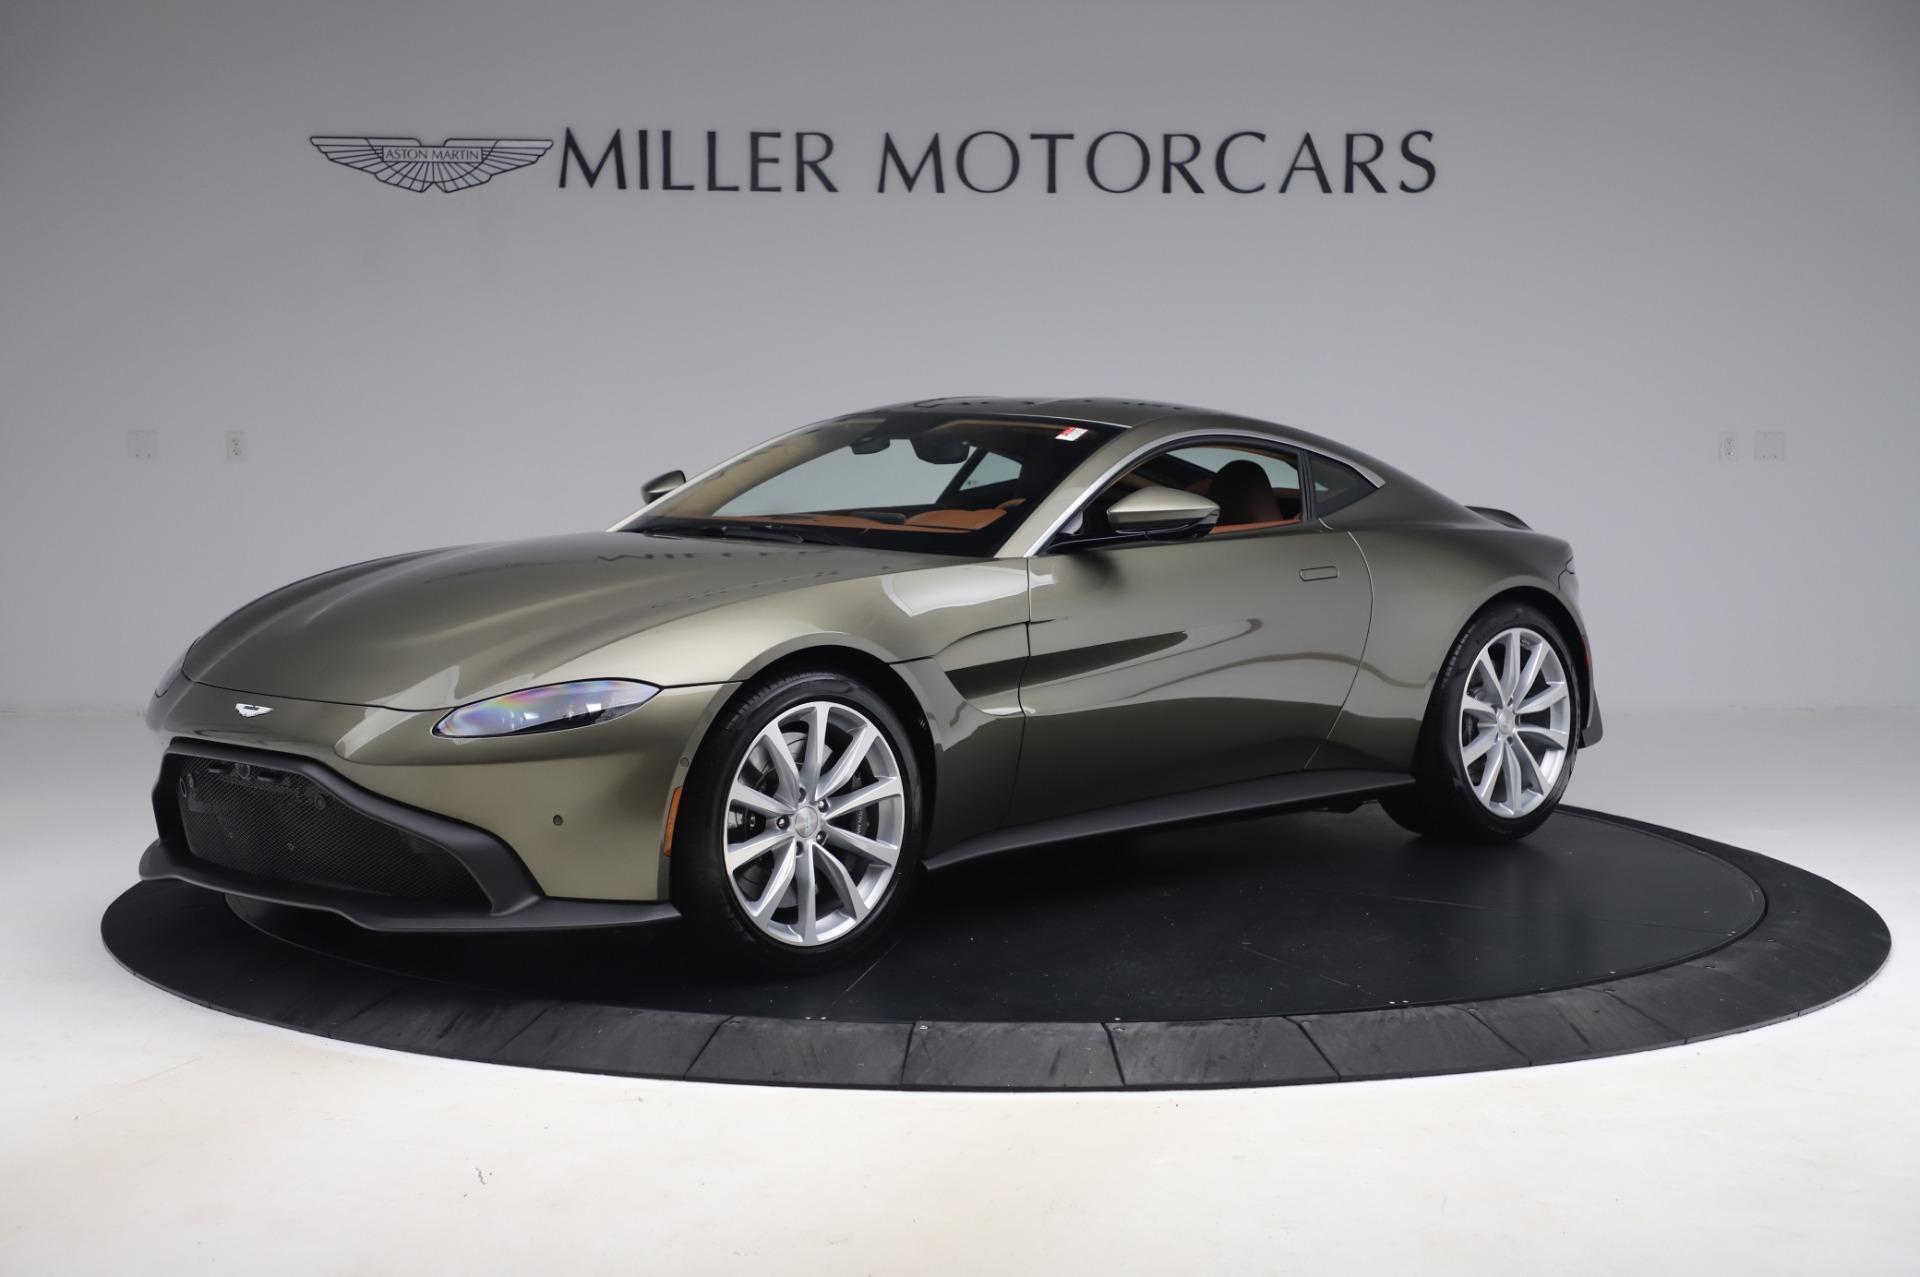 New 2020 Aston Martin Vantage Coupe for sale $180,450 at Bugatti of Greenwich in Greenwich CT 06830 1